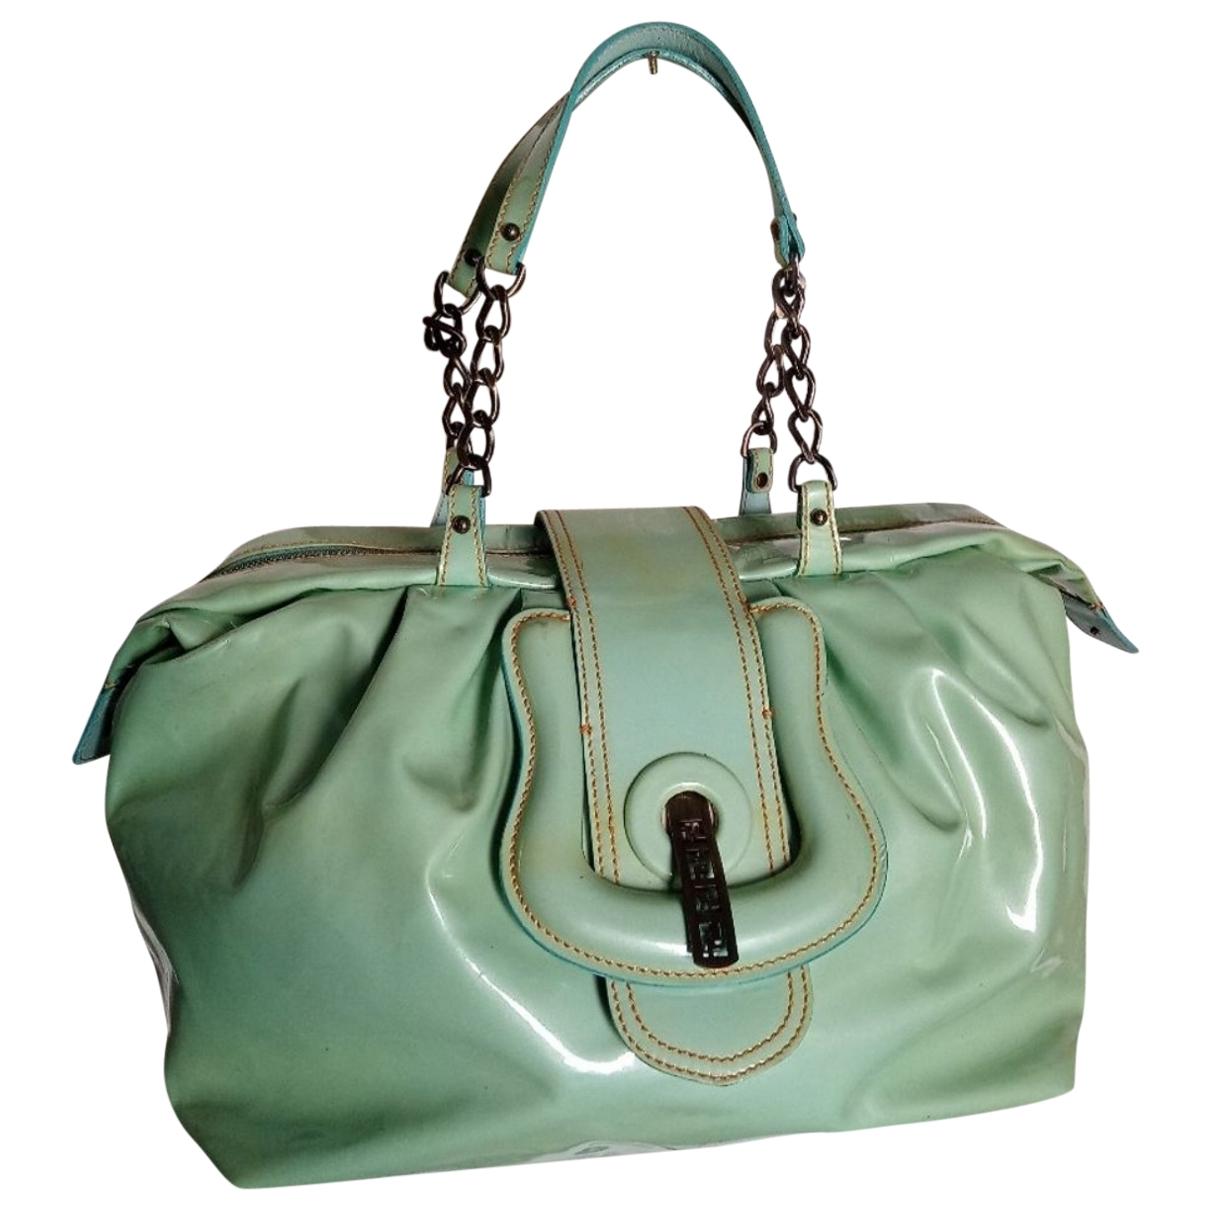 Fendi B Bag Green Patent leather handbag for Women \N